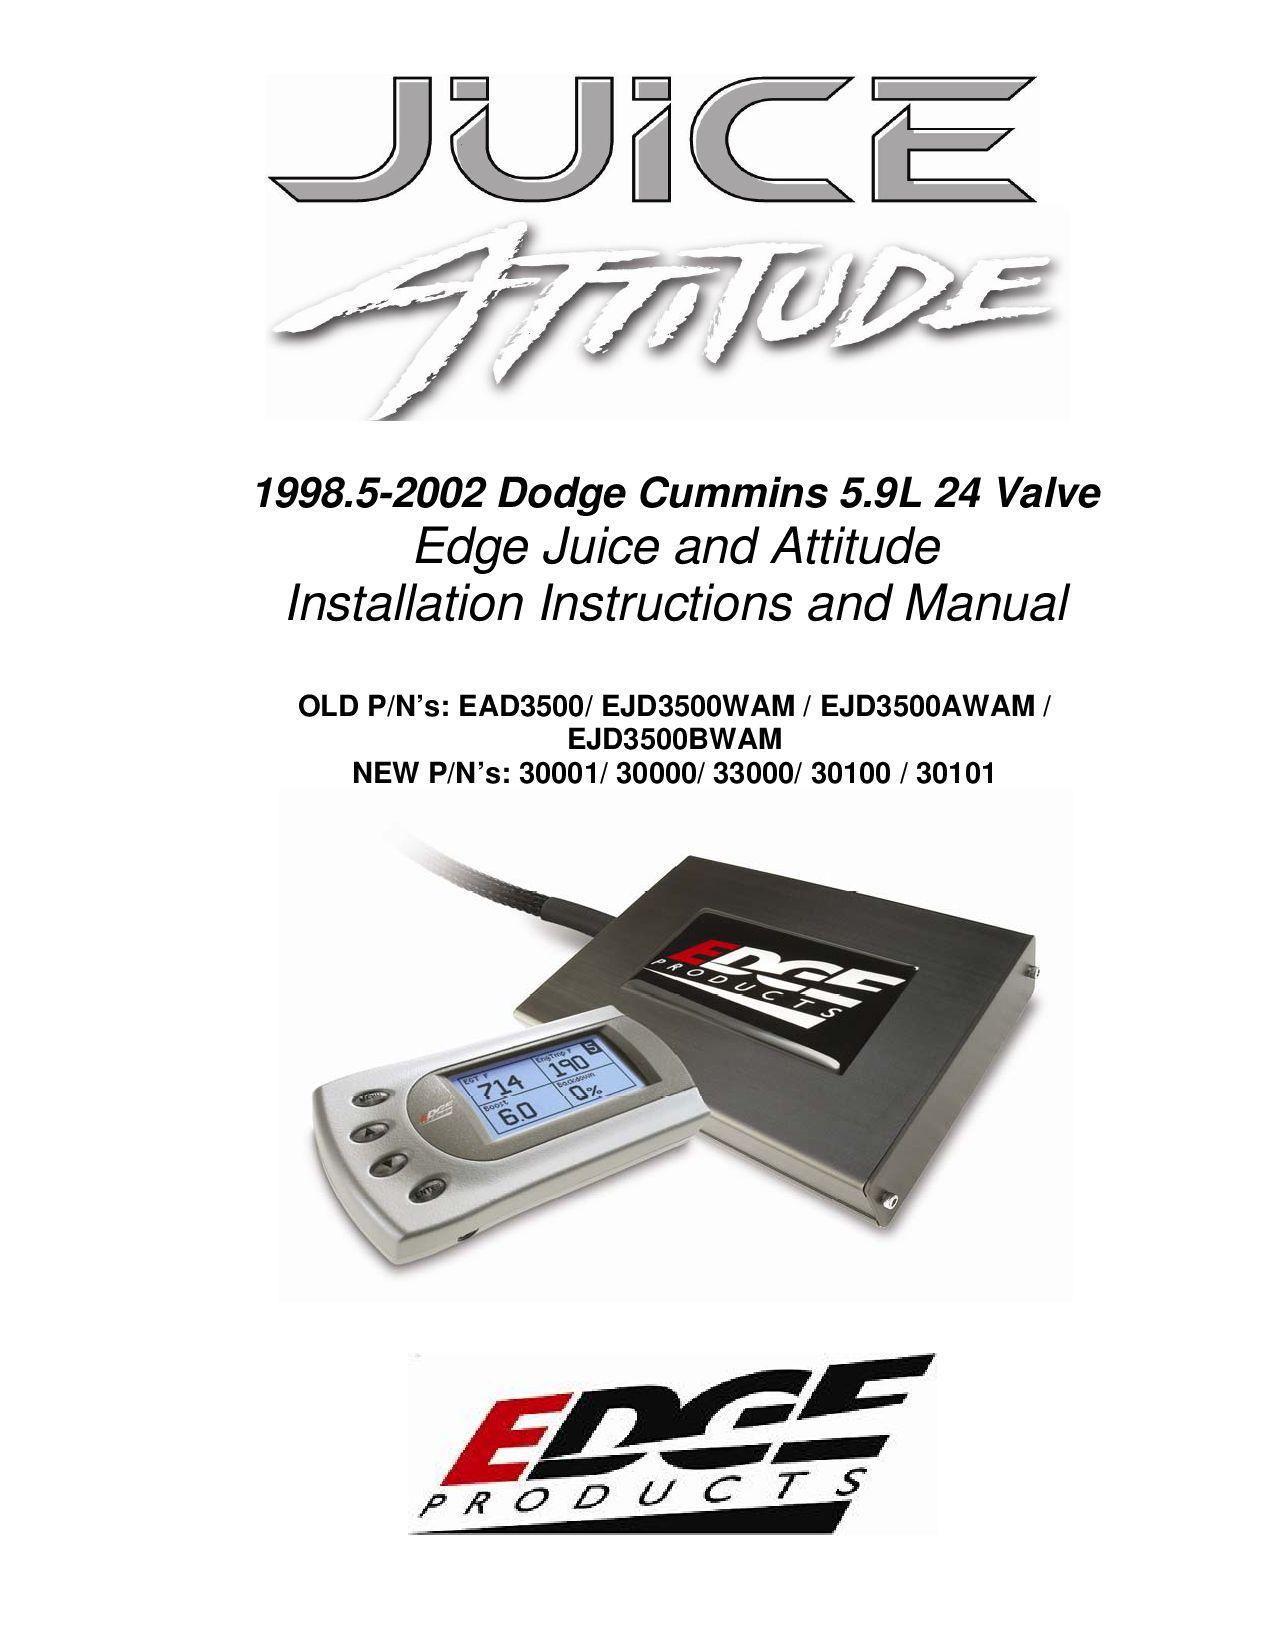 1998.5-2002 Dodge mins Edge Juice and Attitude ... on